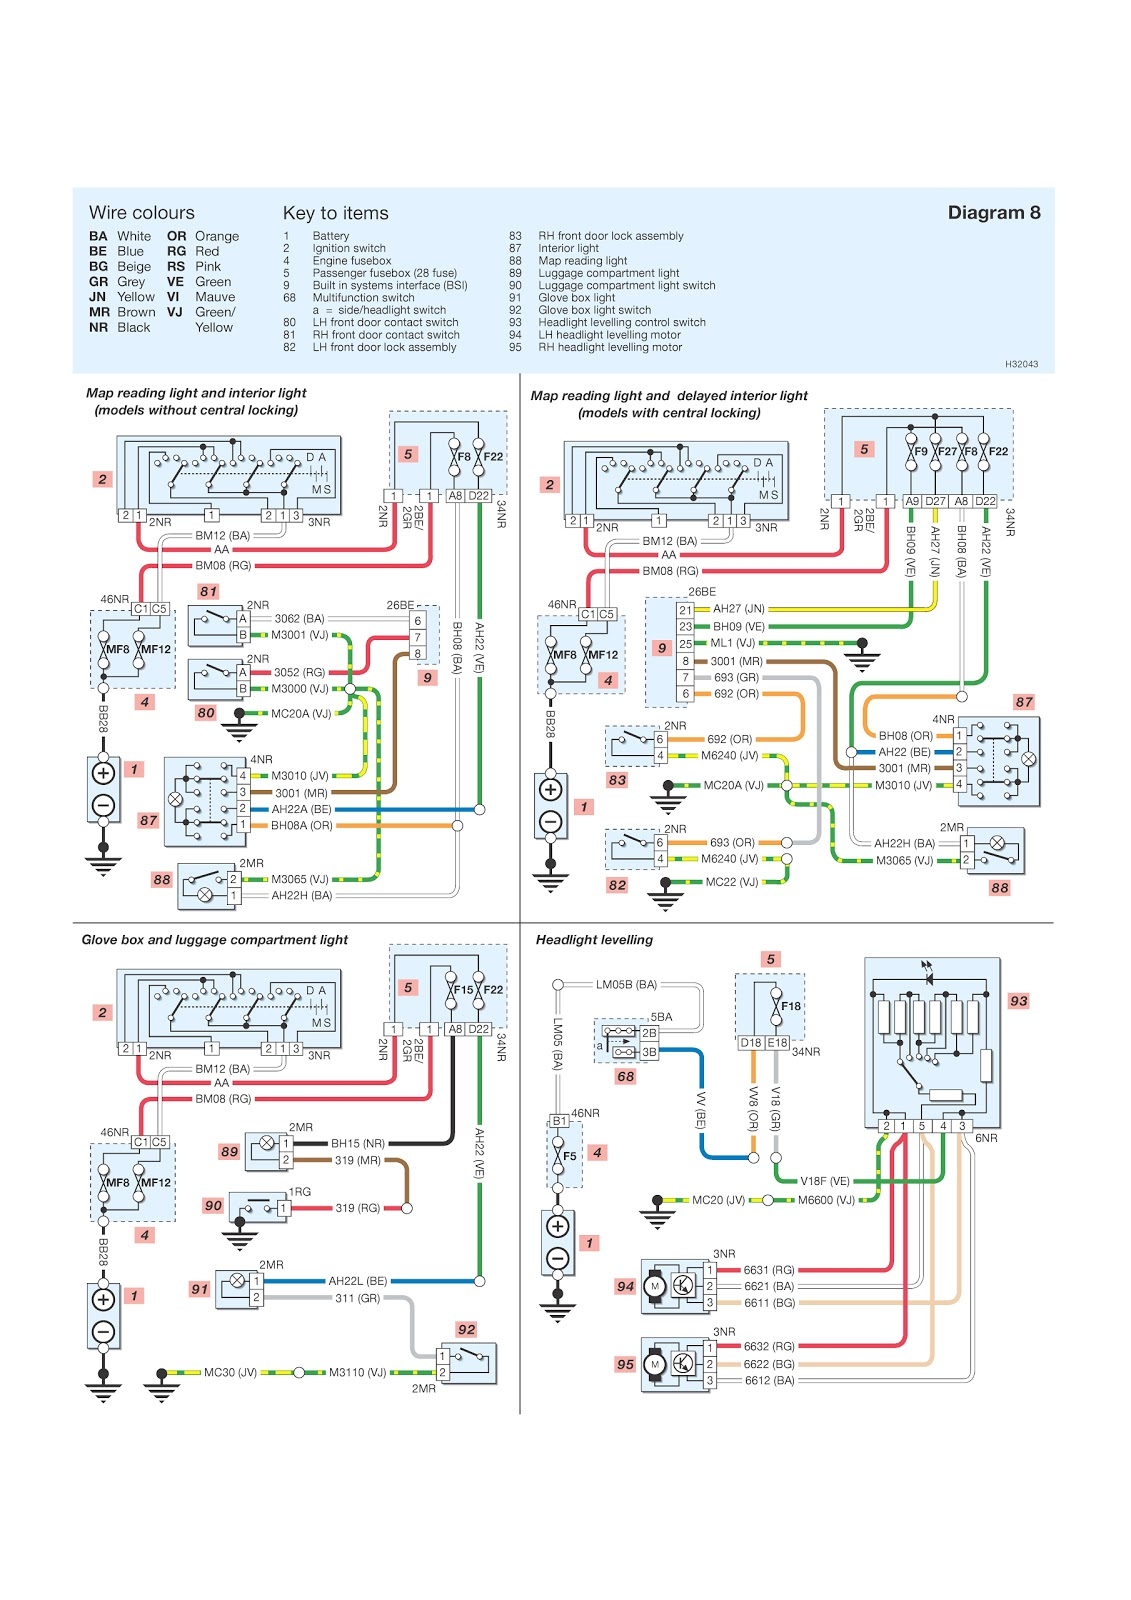 Peugeot Elyseo Wiring Diagram Uzg schullieder de